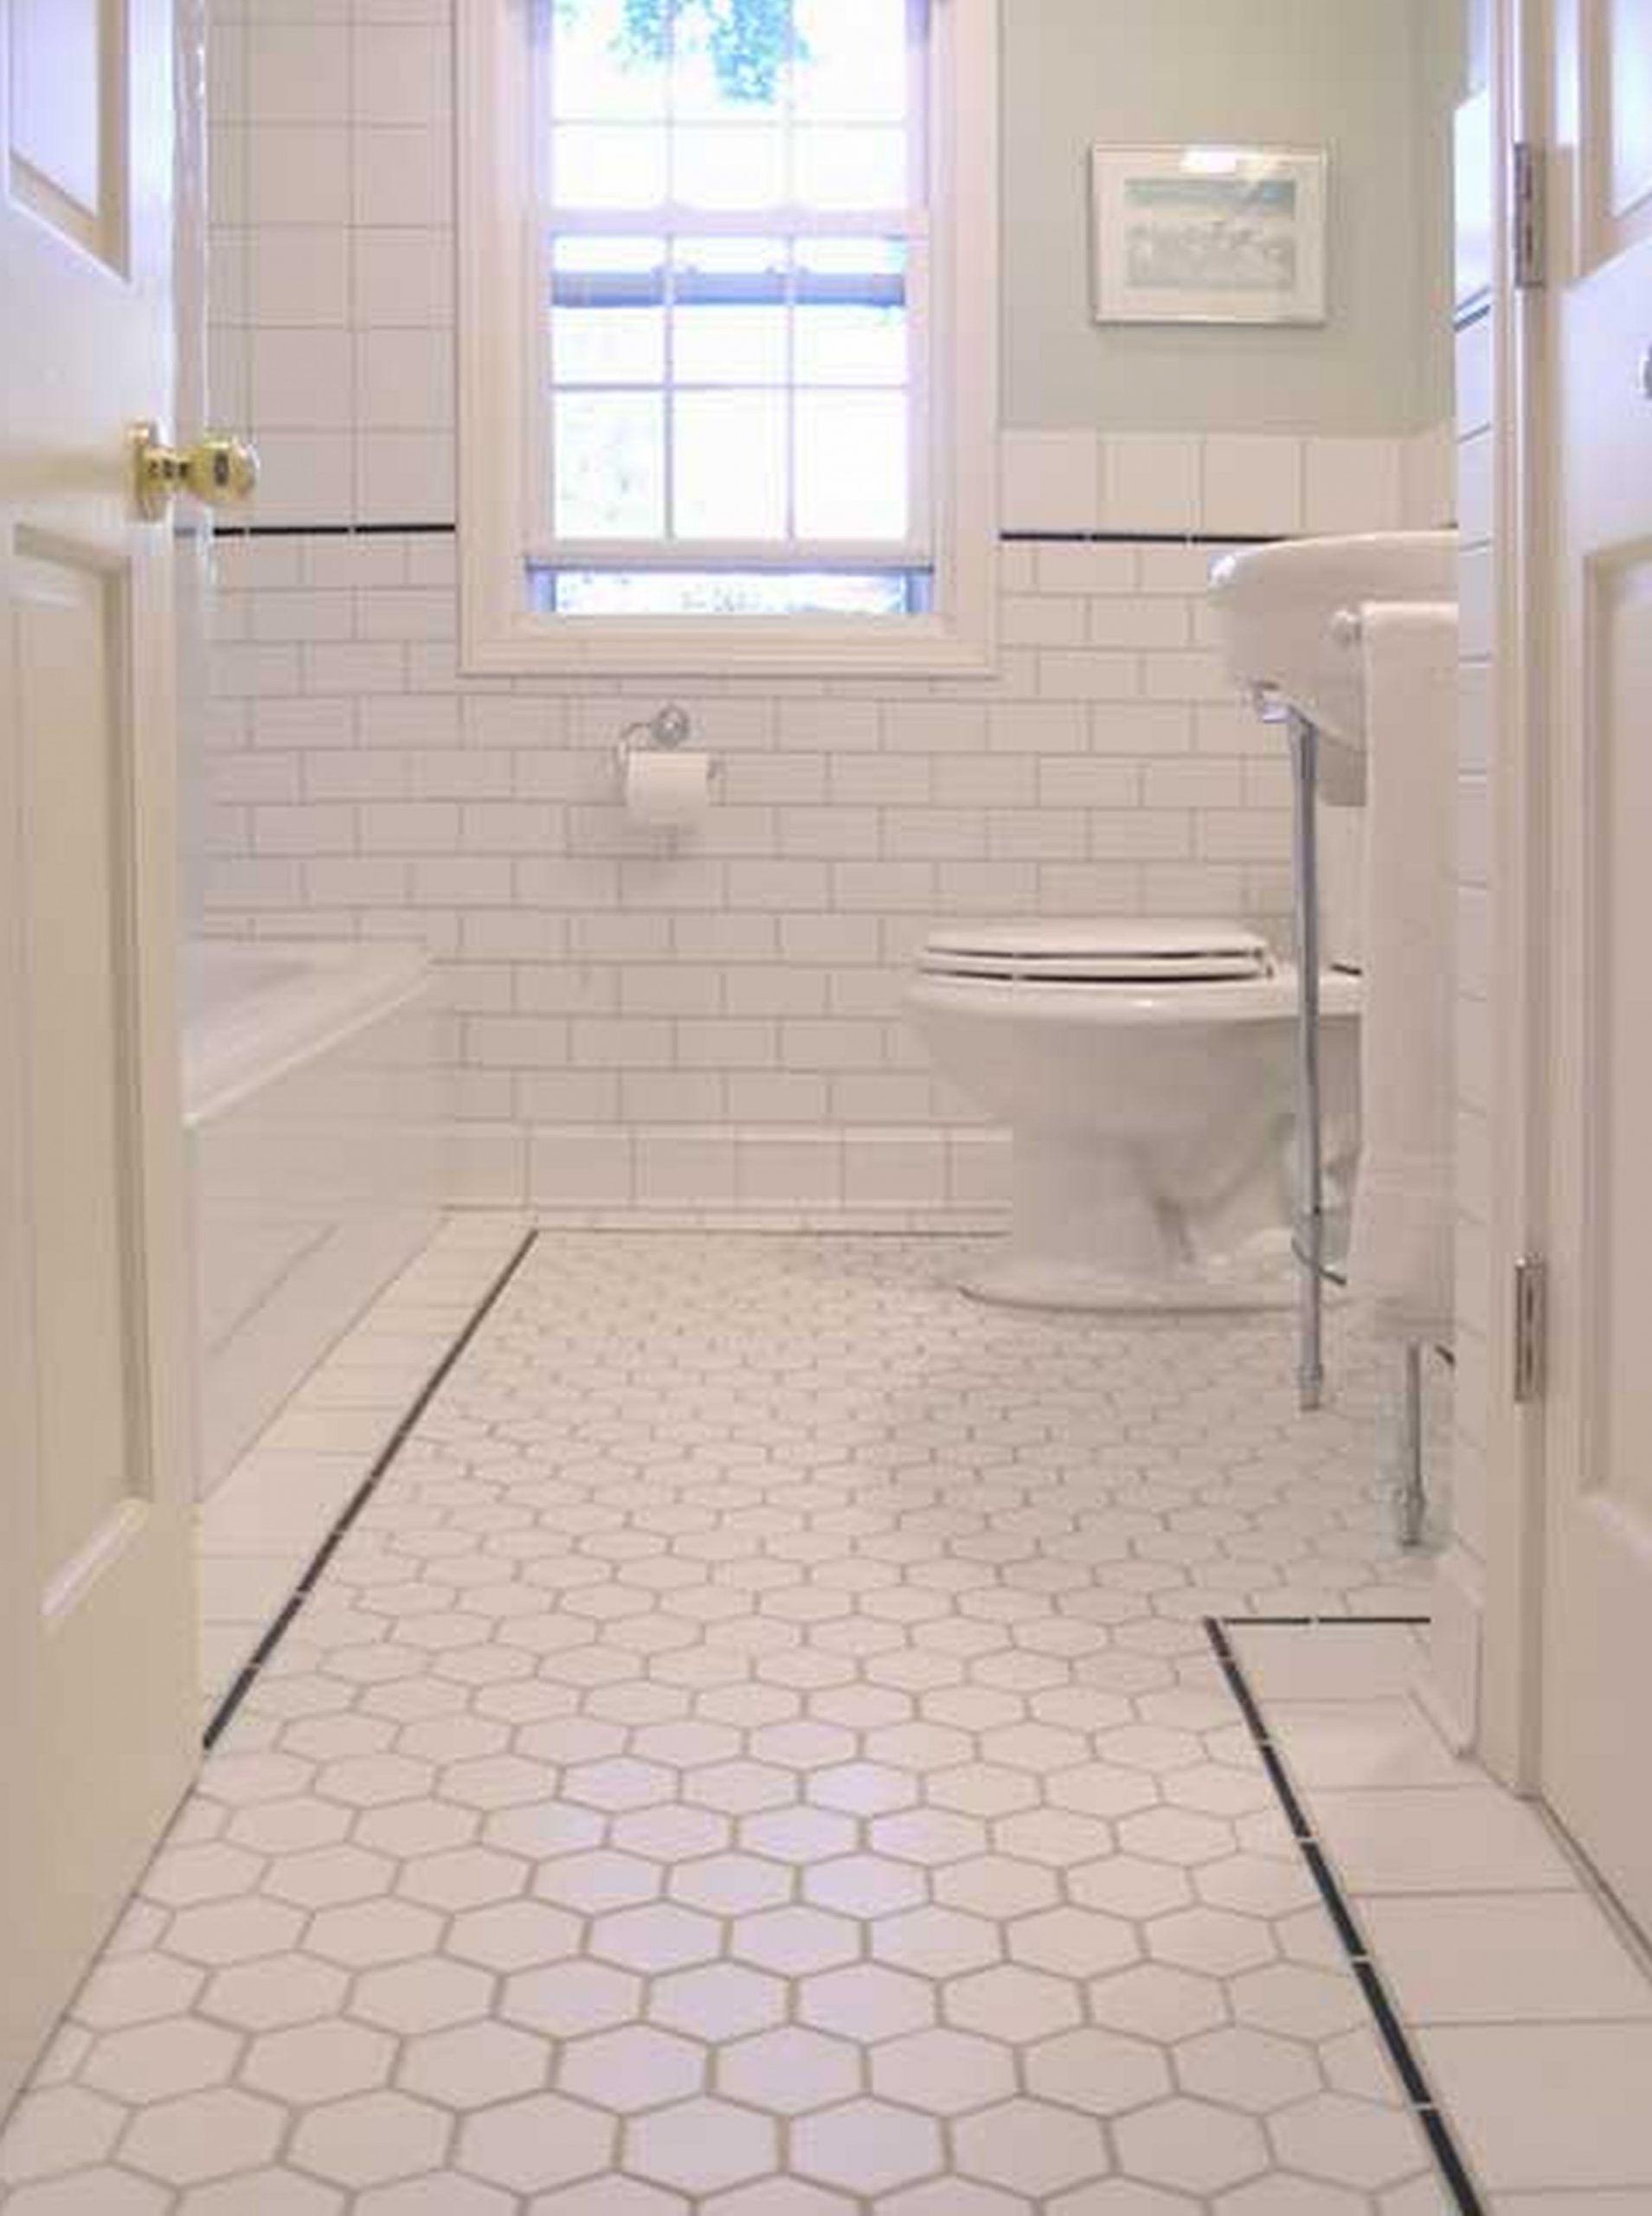 Small Bathroom Tiles Ideas Uk In 2020 Vintage Bathroom Tile White Bathroom Tiles Small Bathroom Renovations